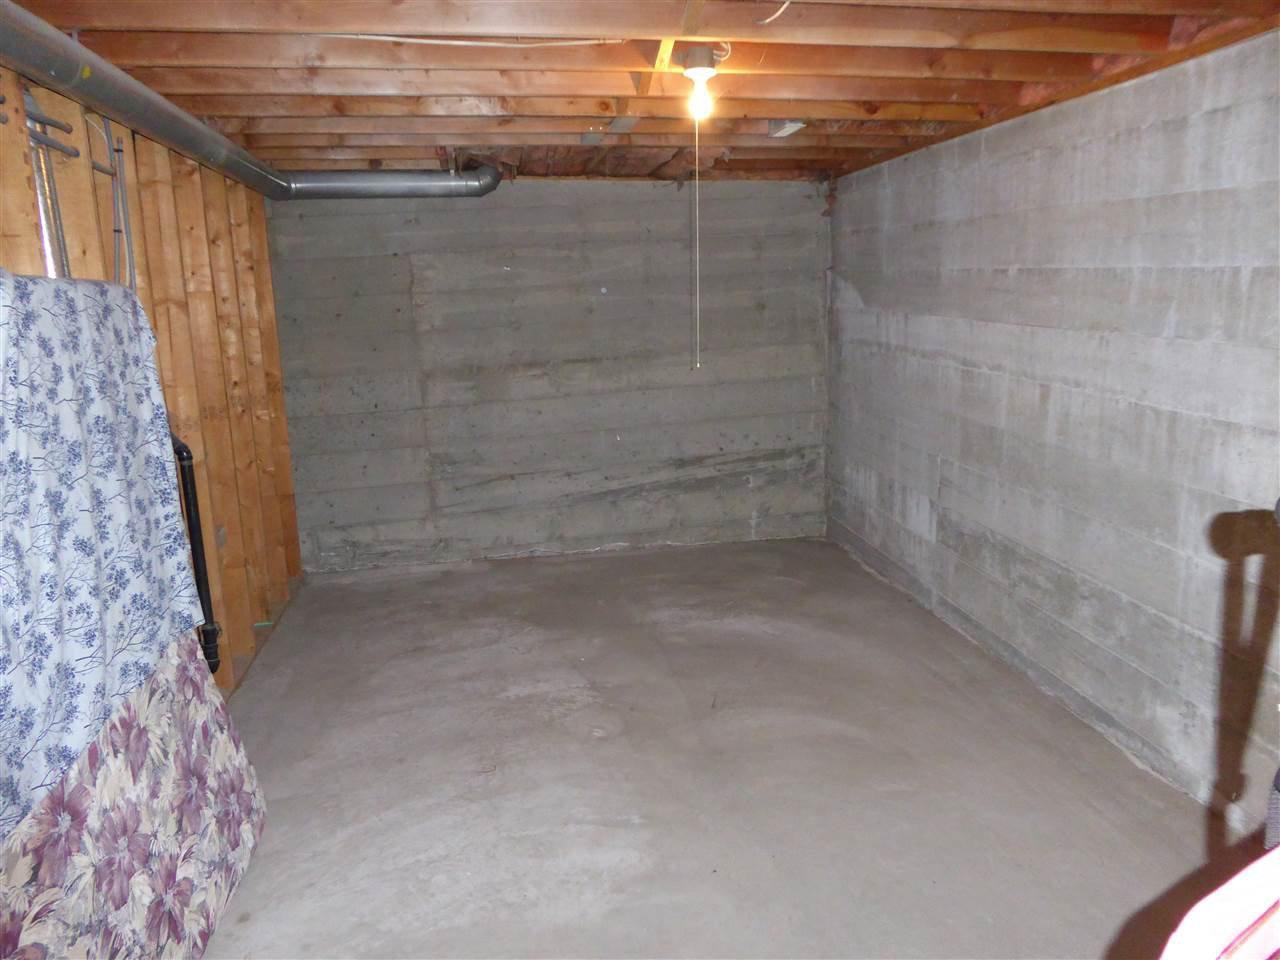 Photo 17: Photos: 1252 DEWAR Way in Port Coquitlam: Citadel PQ House for sale : MLS®# R2199639